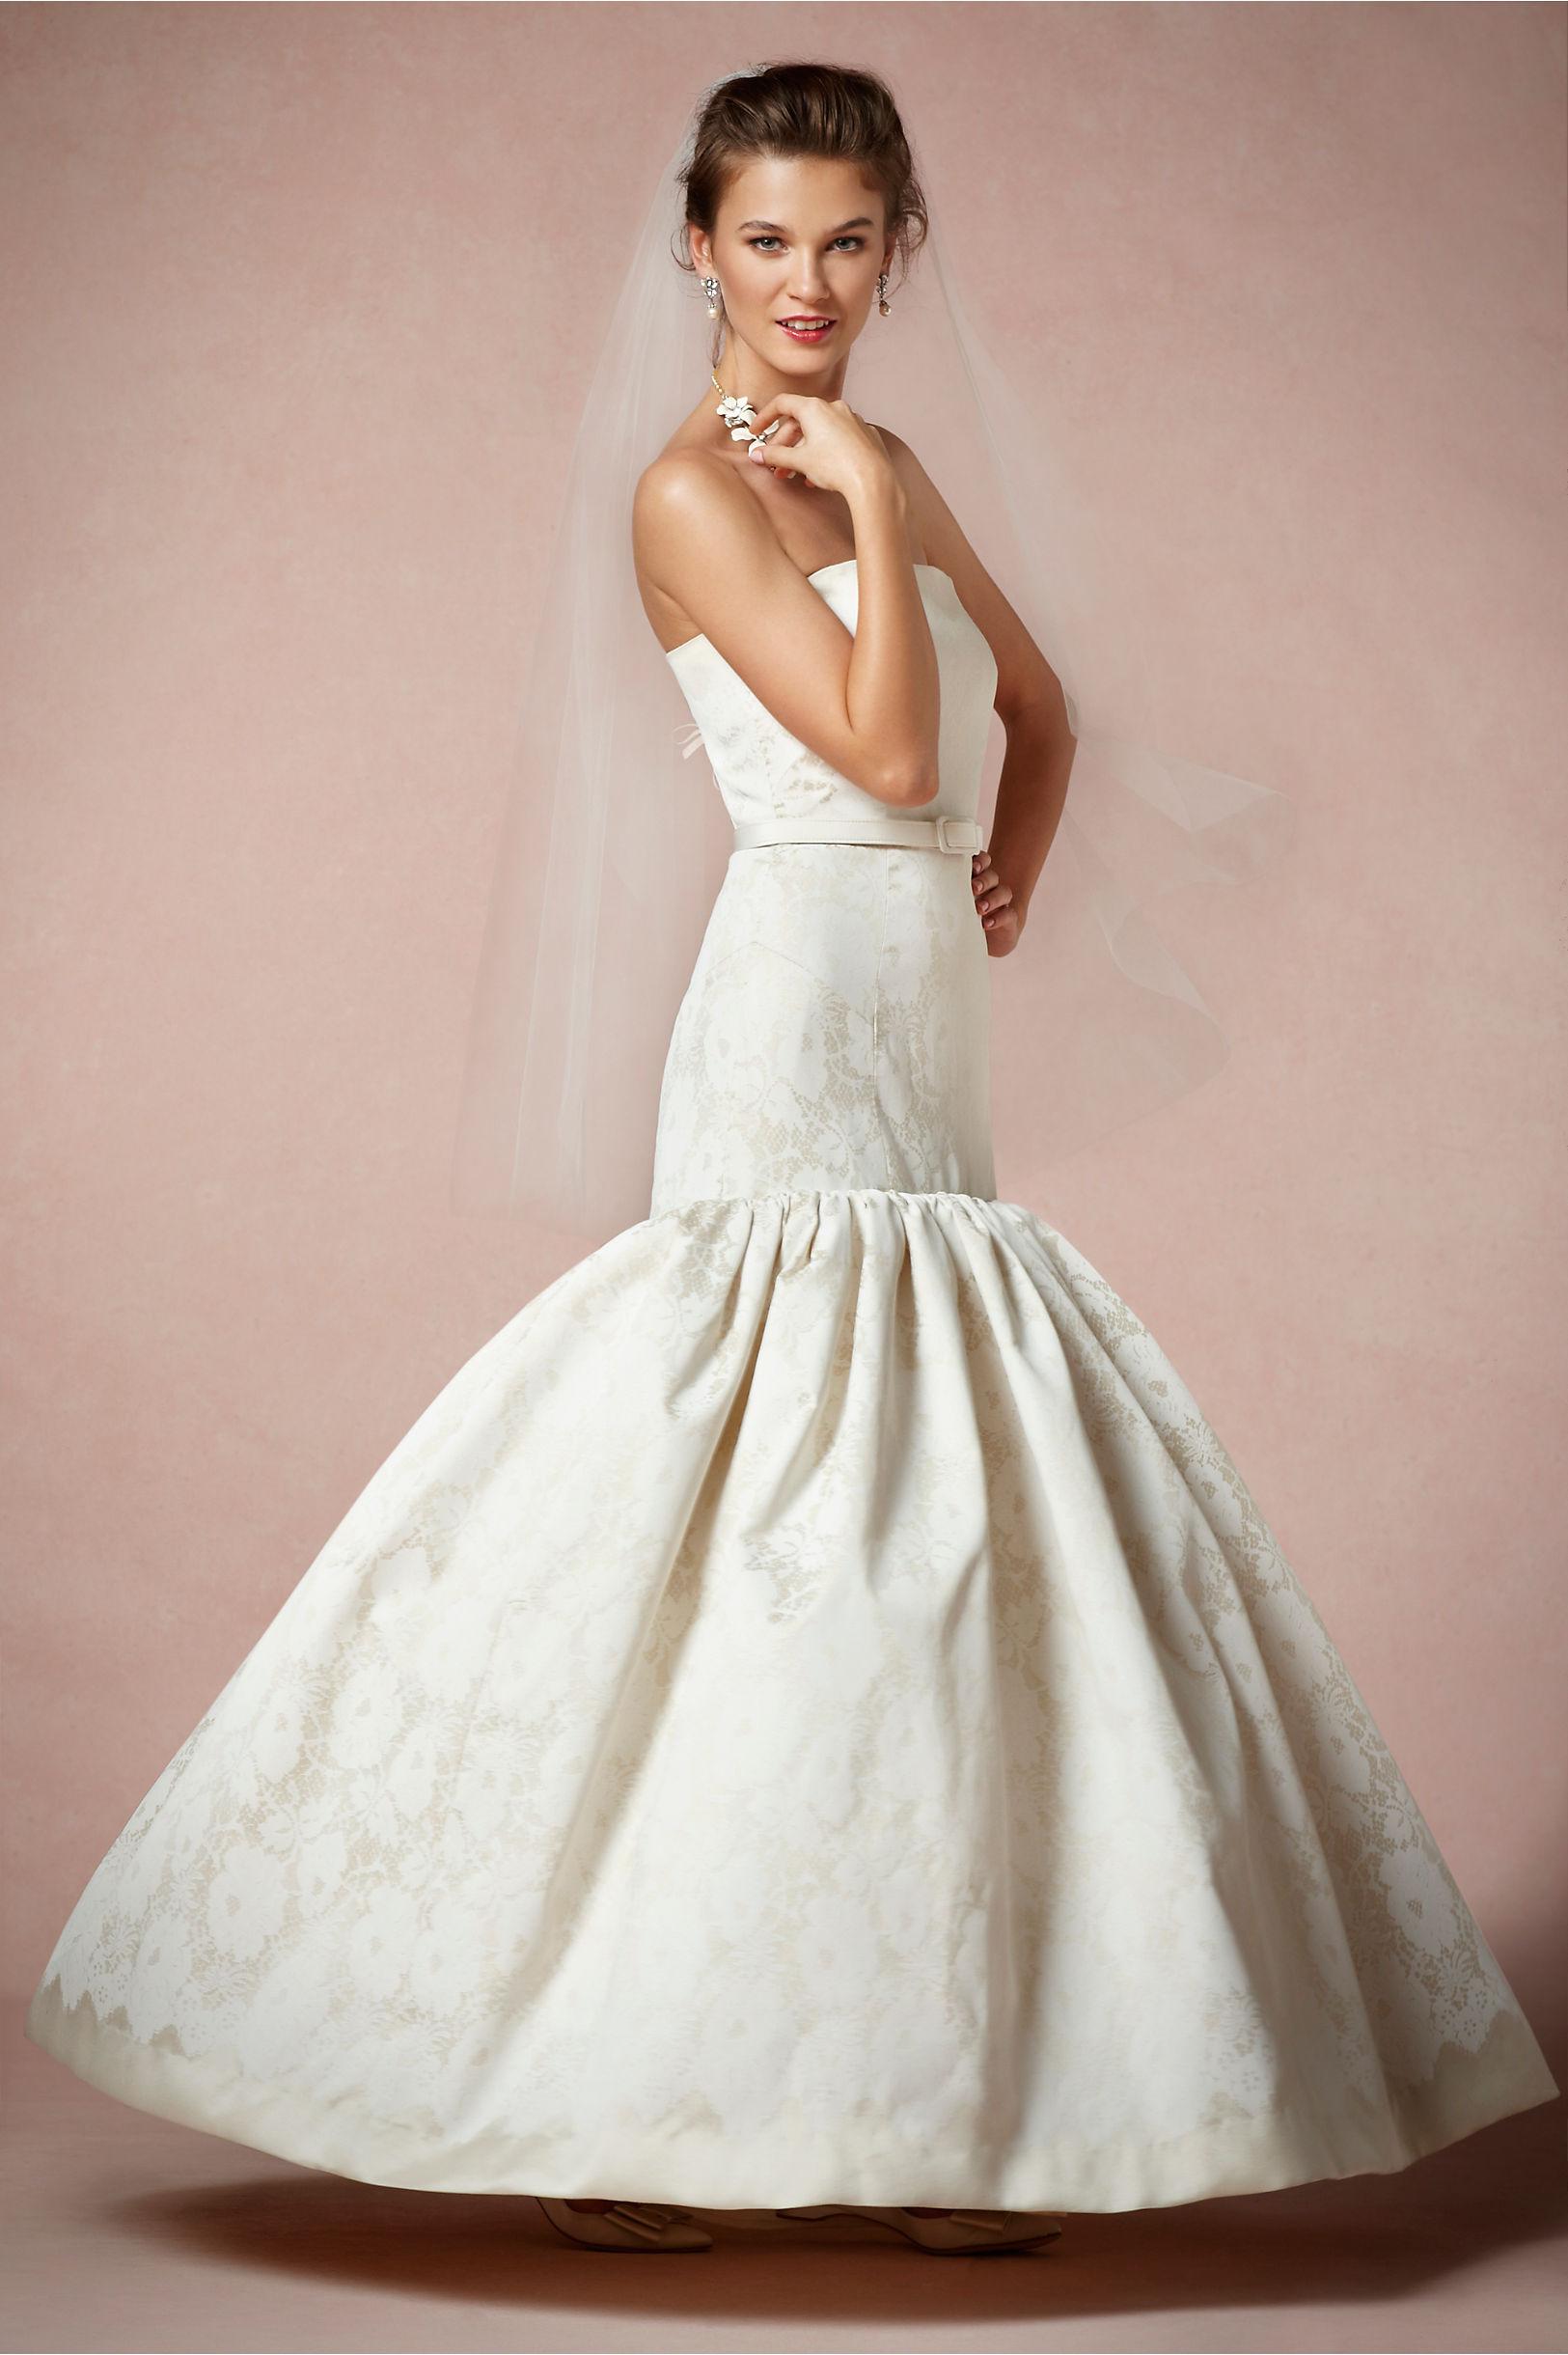 Strapless mermaid wedding dress vintage inspired for Vintage mermaid wedding dress